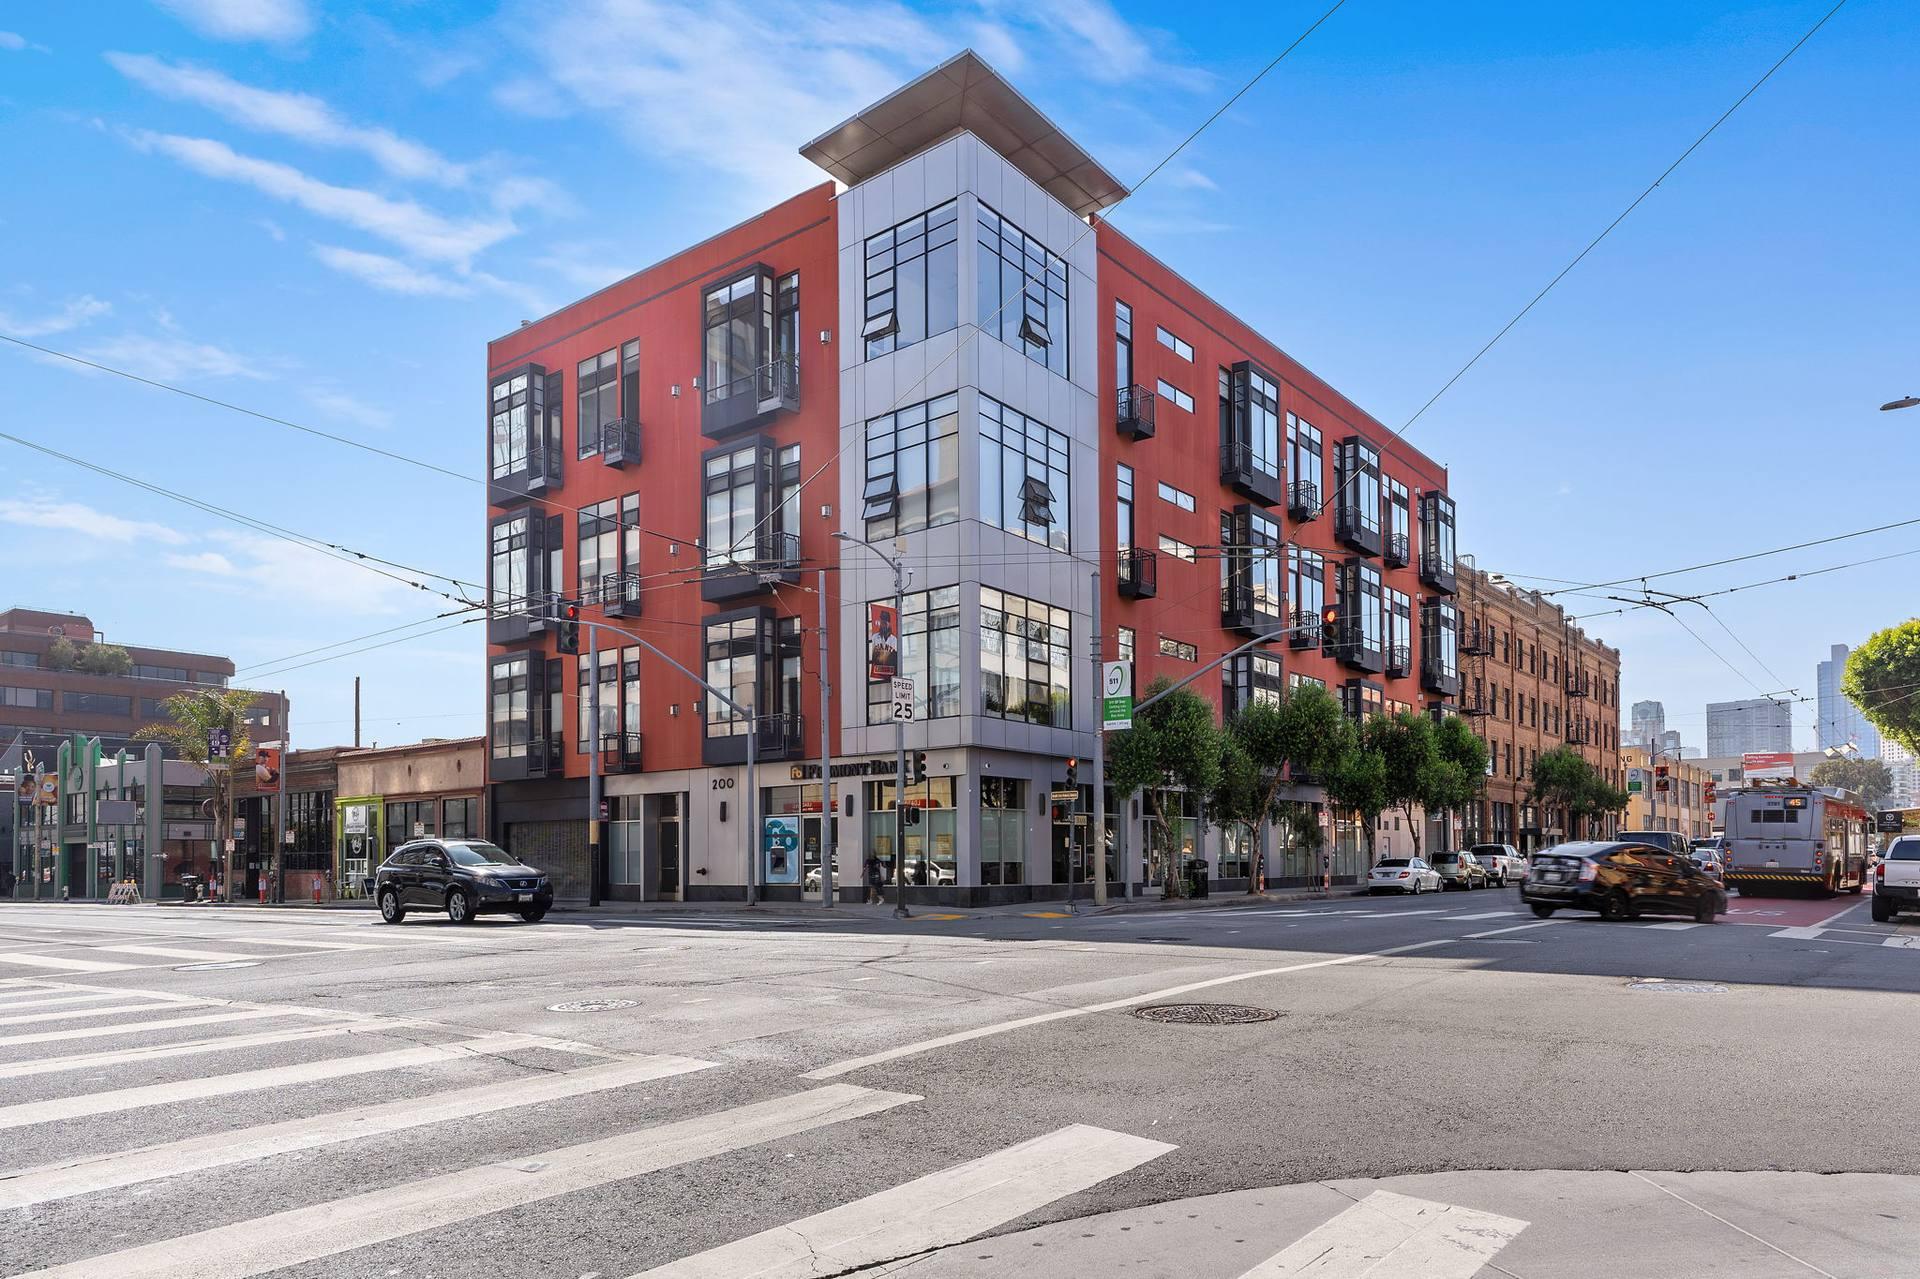 200 Townsend St, San Francisco, CA 94107, USA